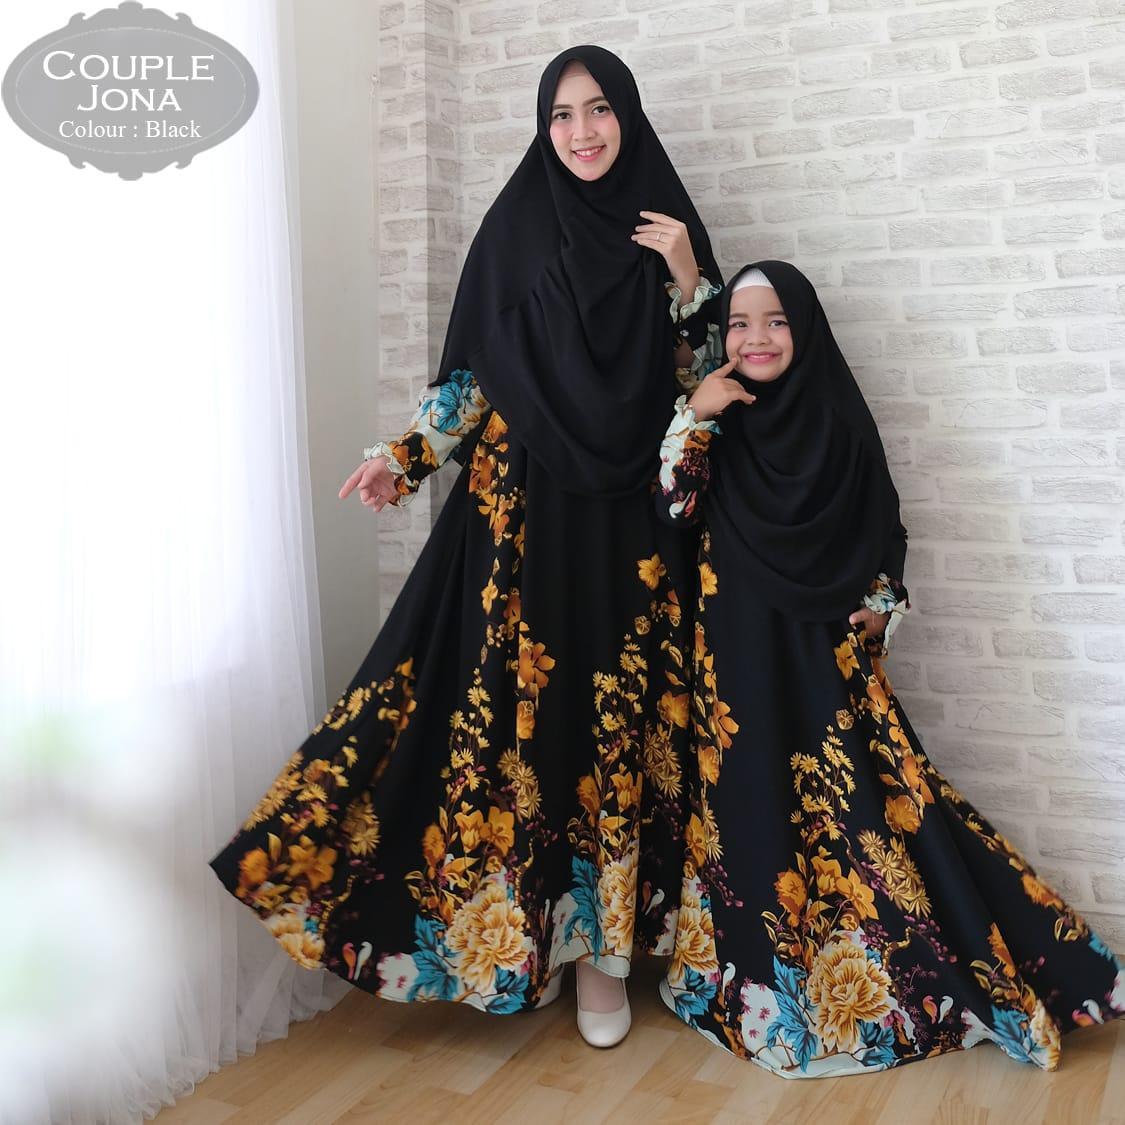 key&kay88 gamis muslim syar'i monalisa jona kyara ibu dan anak couple